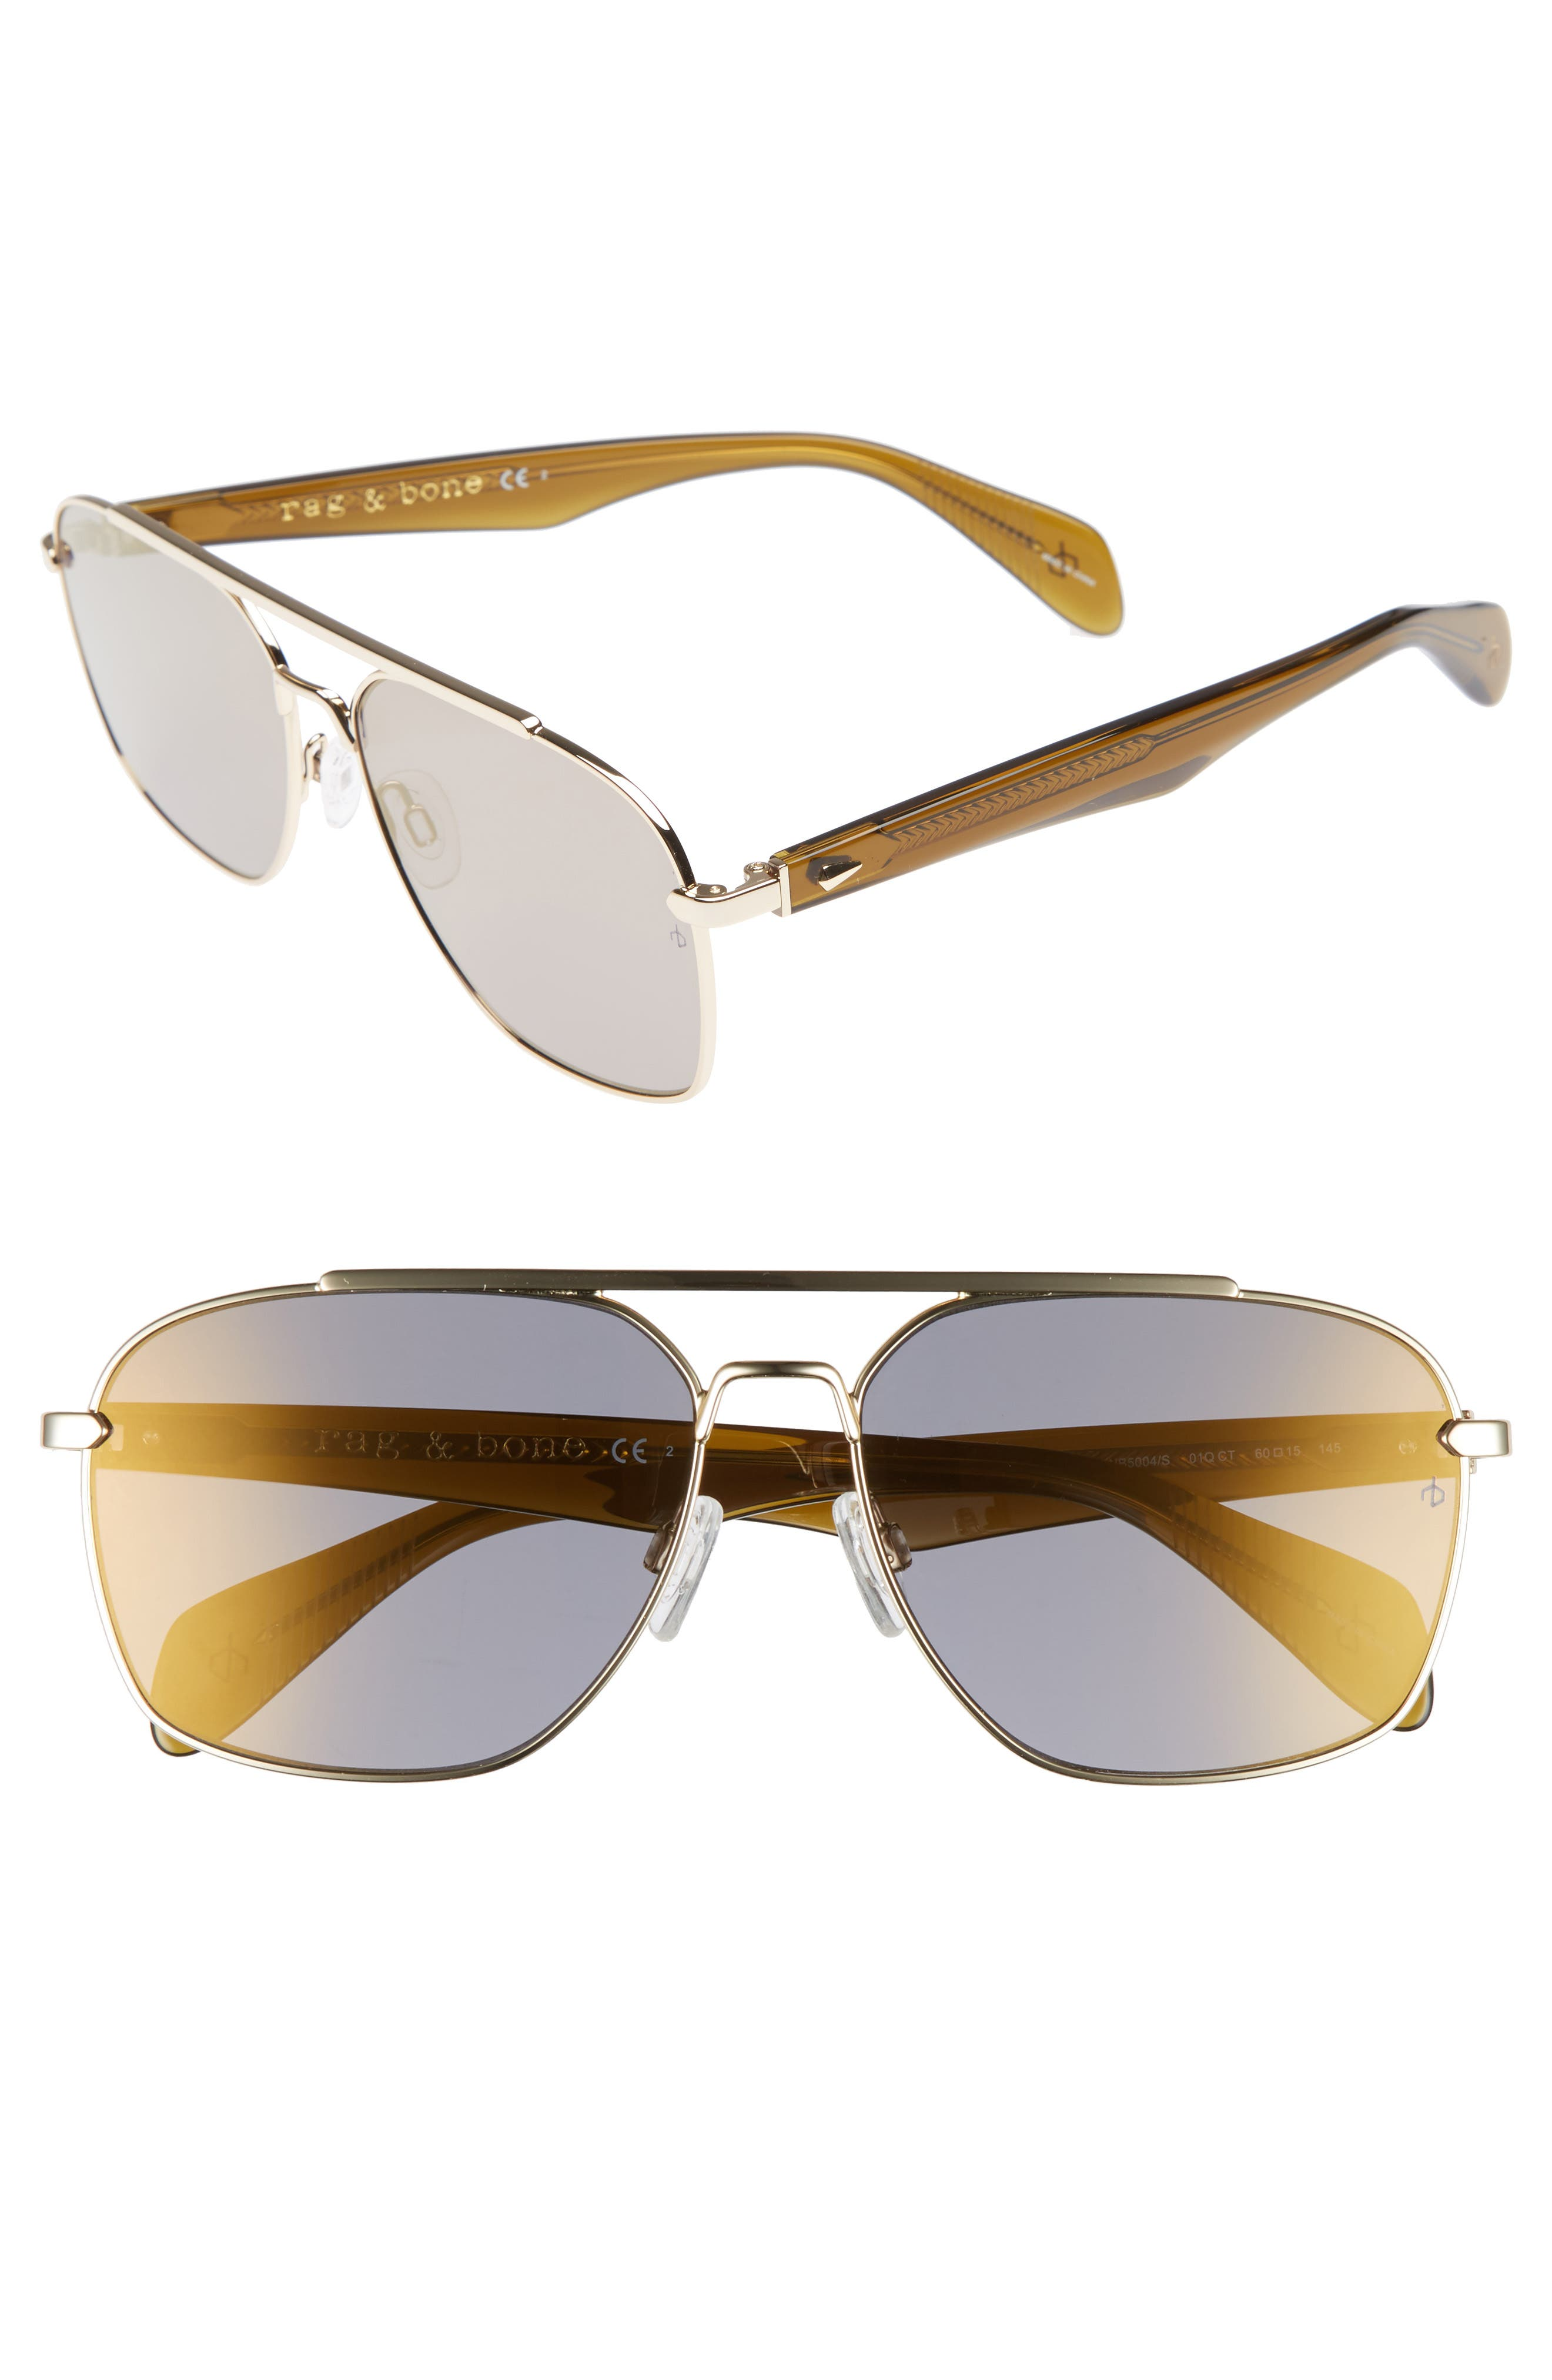 Main Image - rag & bone 60mm Navigator Sunglasses